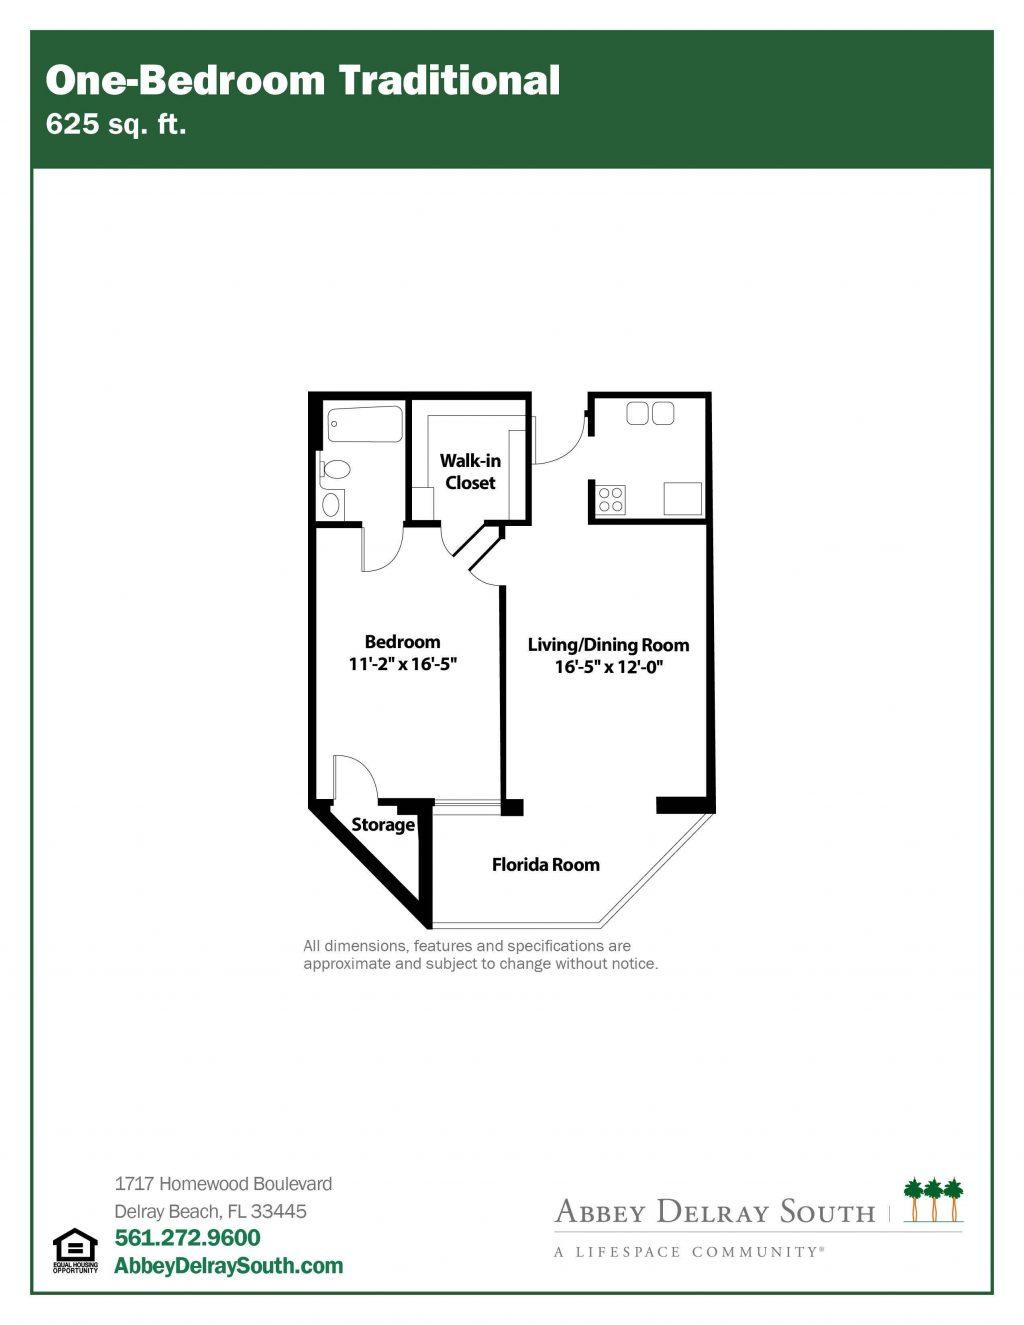 Abbey Delray South 1717 Homewood Blvd Delray Beach Fl 33445 Senior Living Guide